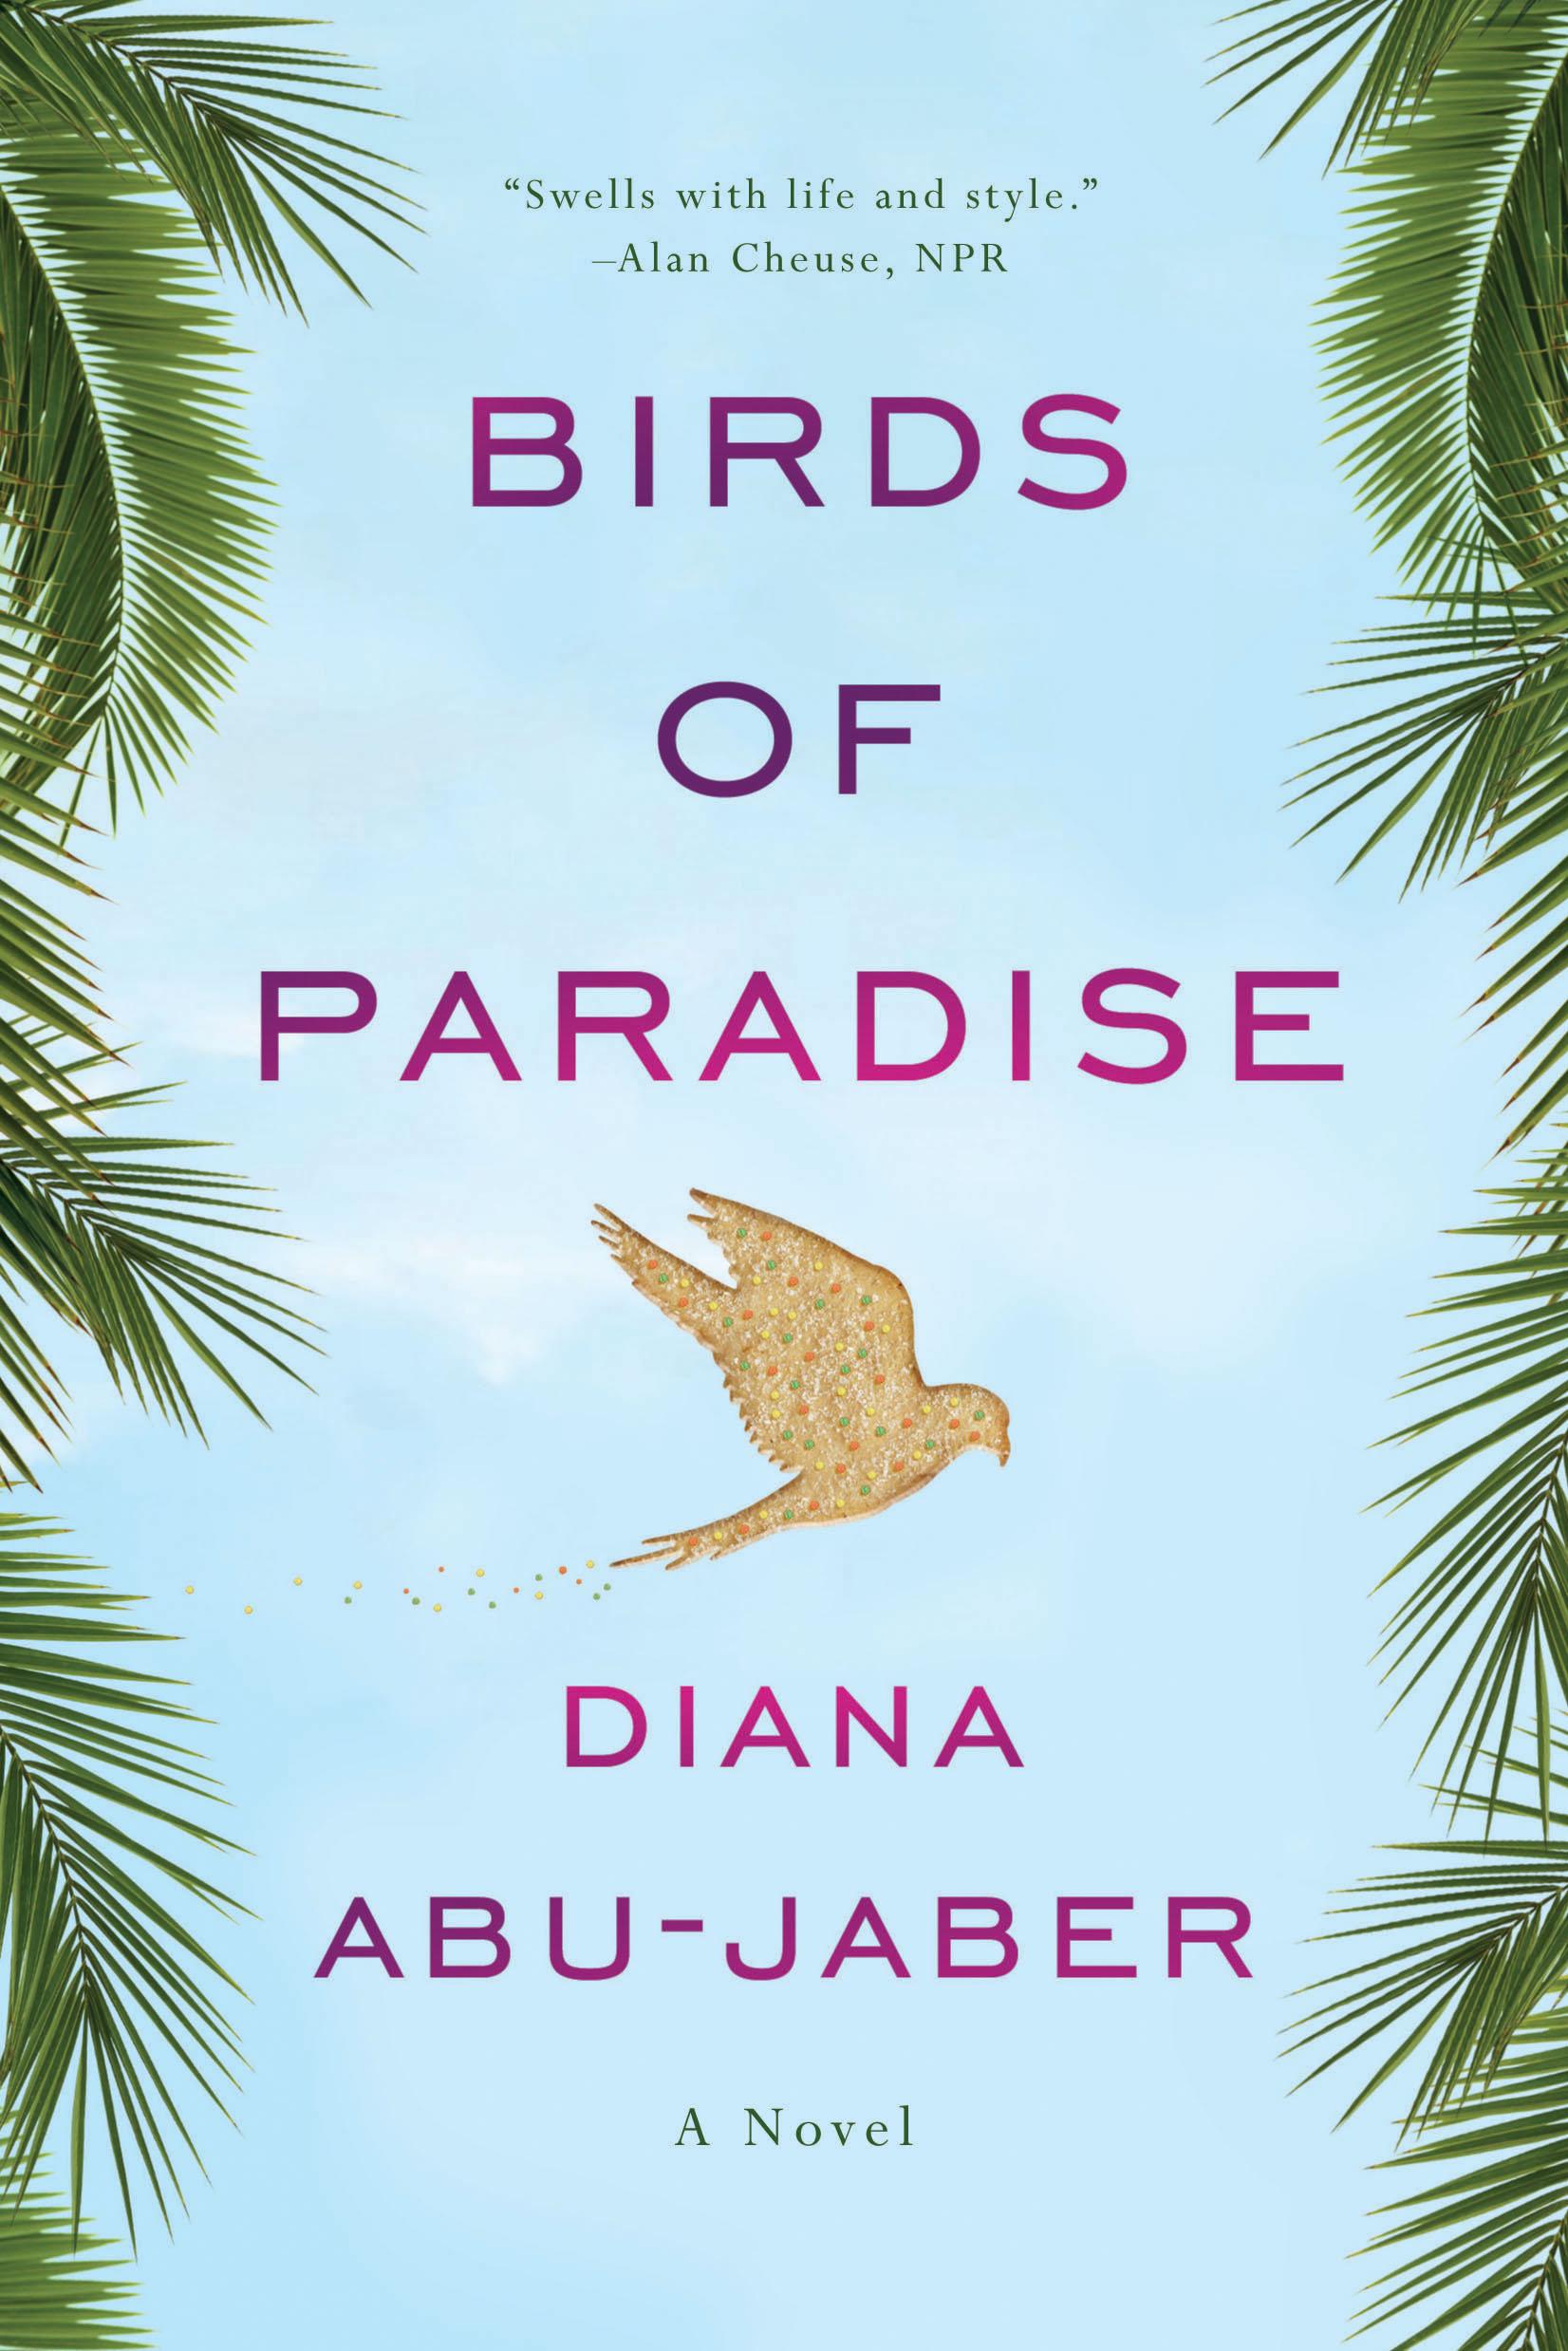 book doctors interview diana abu jaber on how to write literary 2014 06 05 birdsofparadisepbk jpg